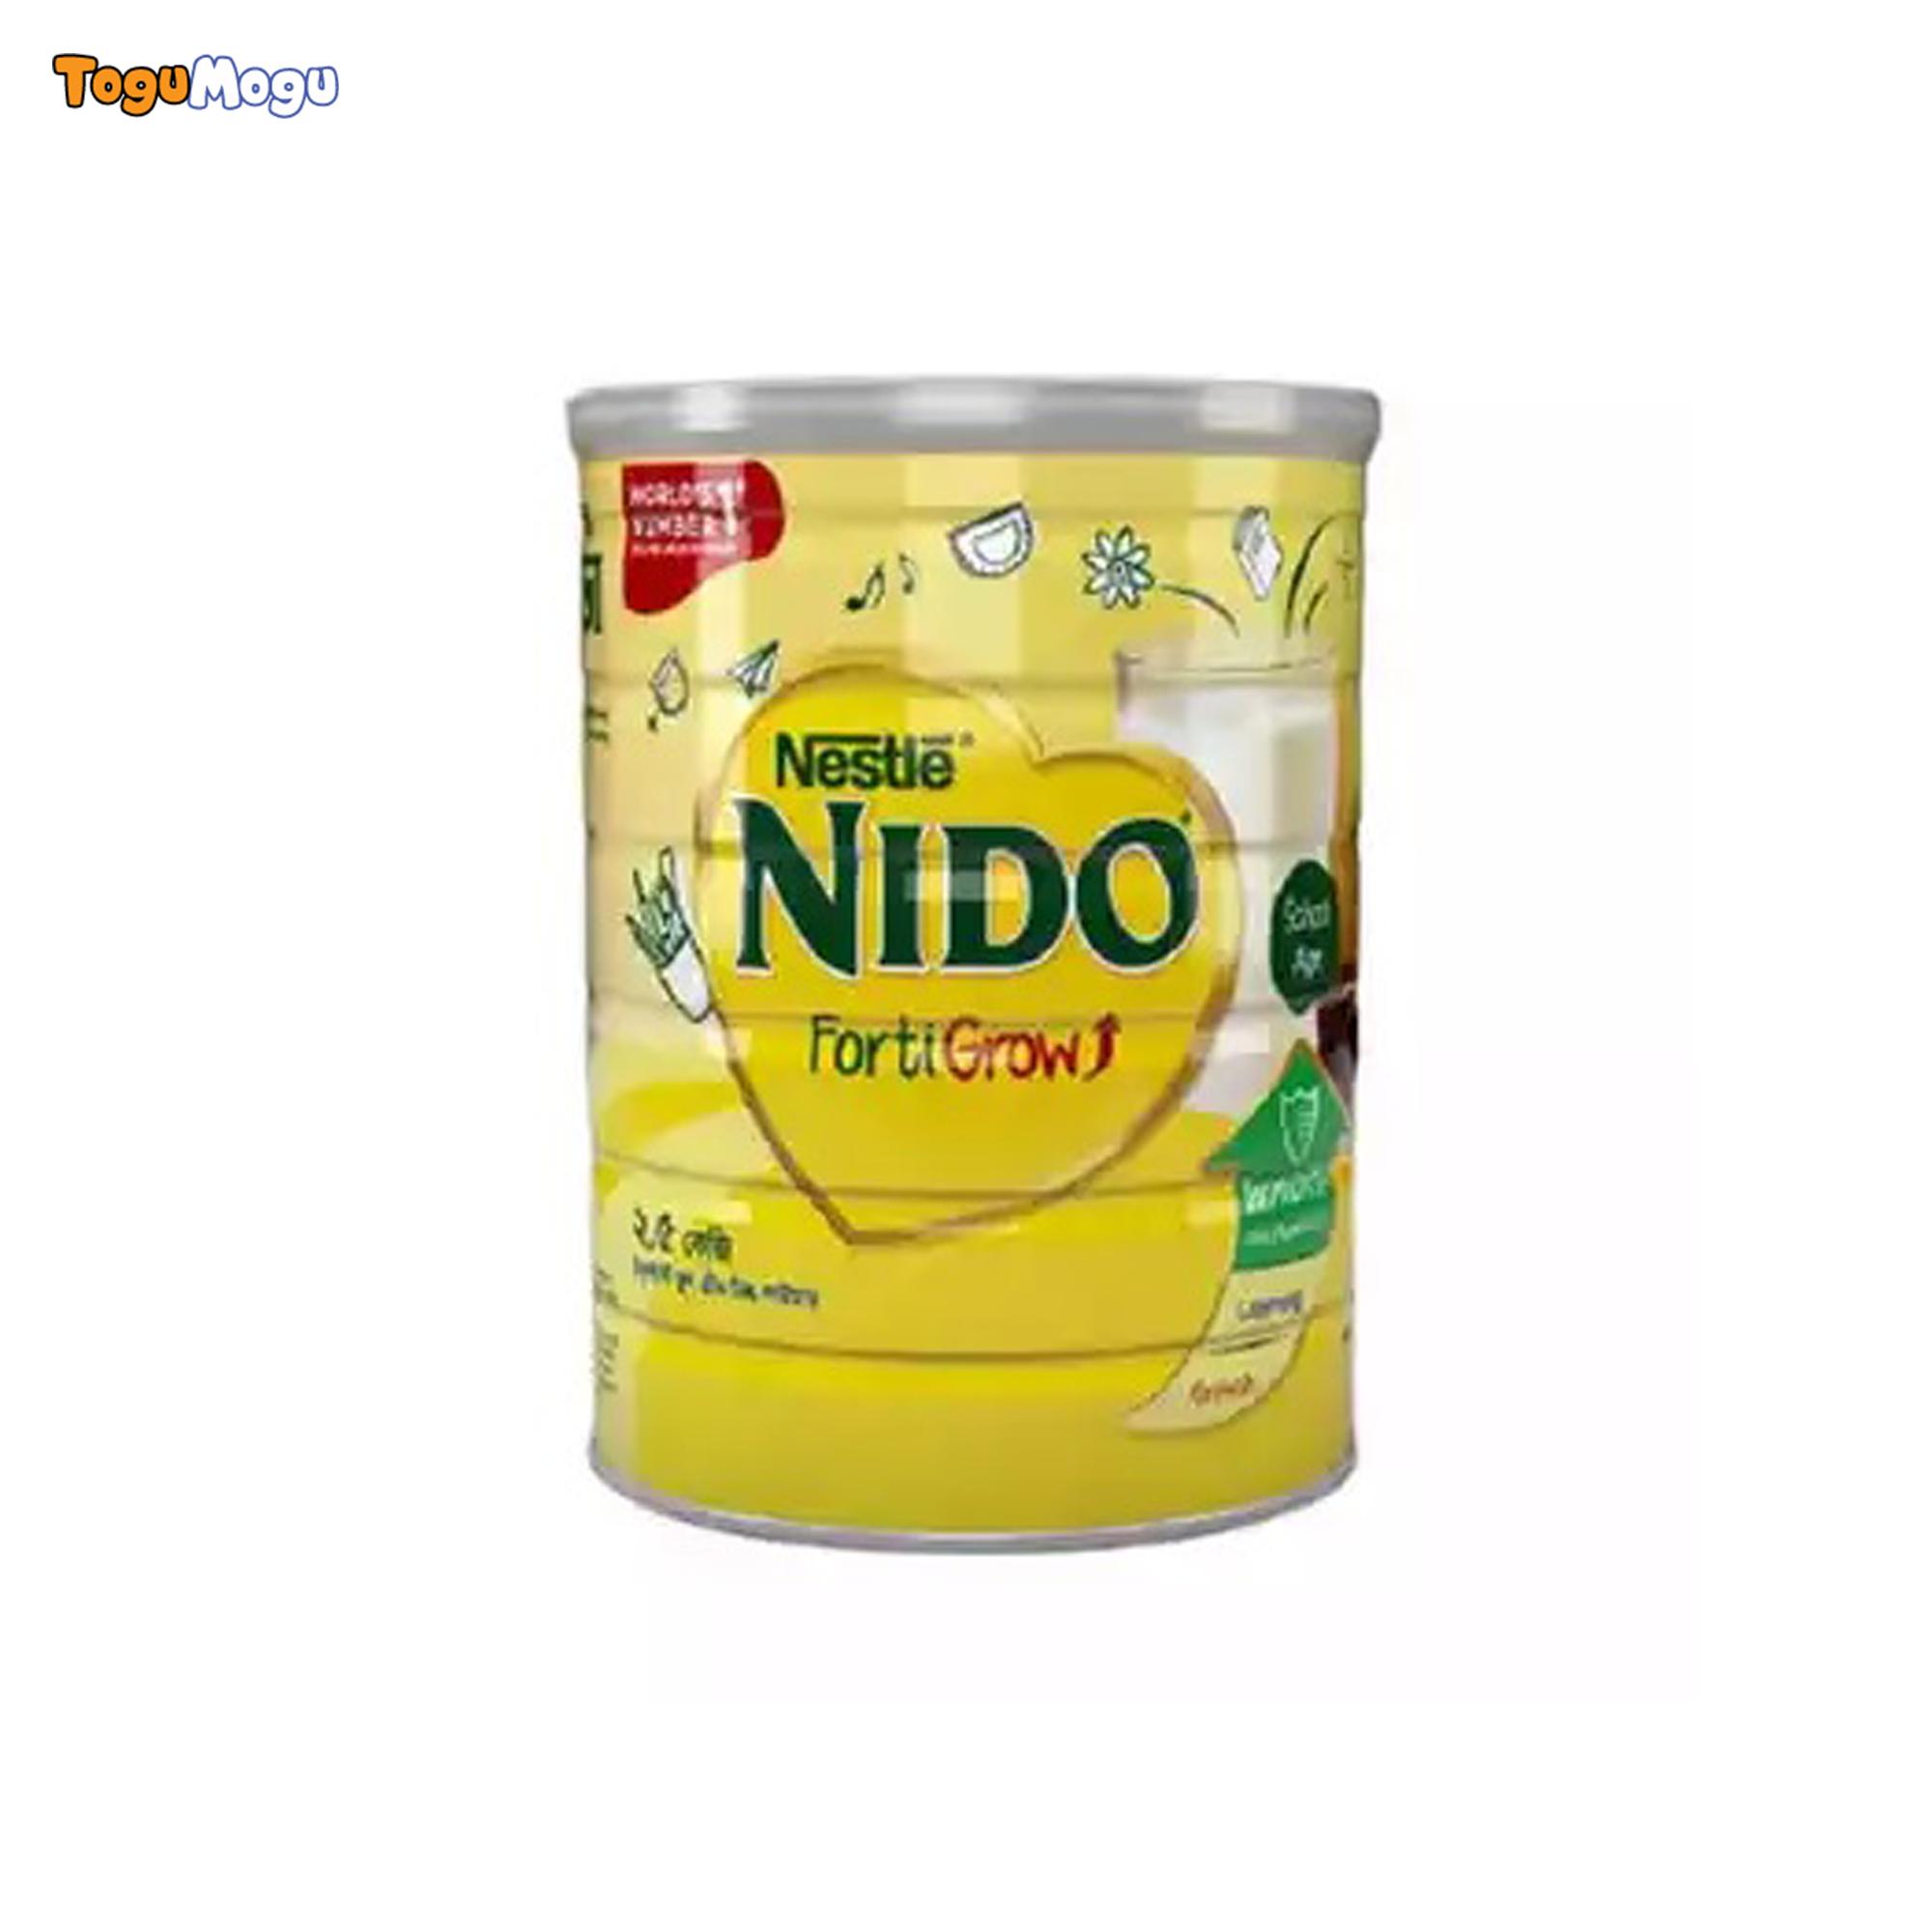 NIDO Fortigrow Tin 2.5kg